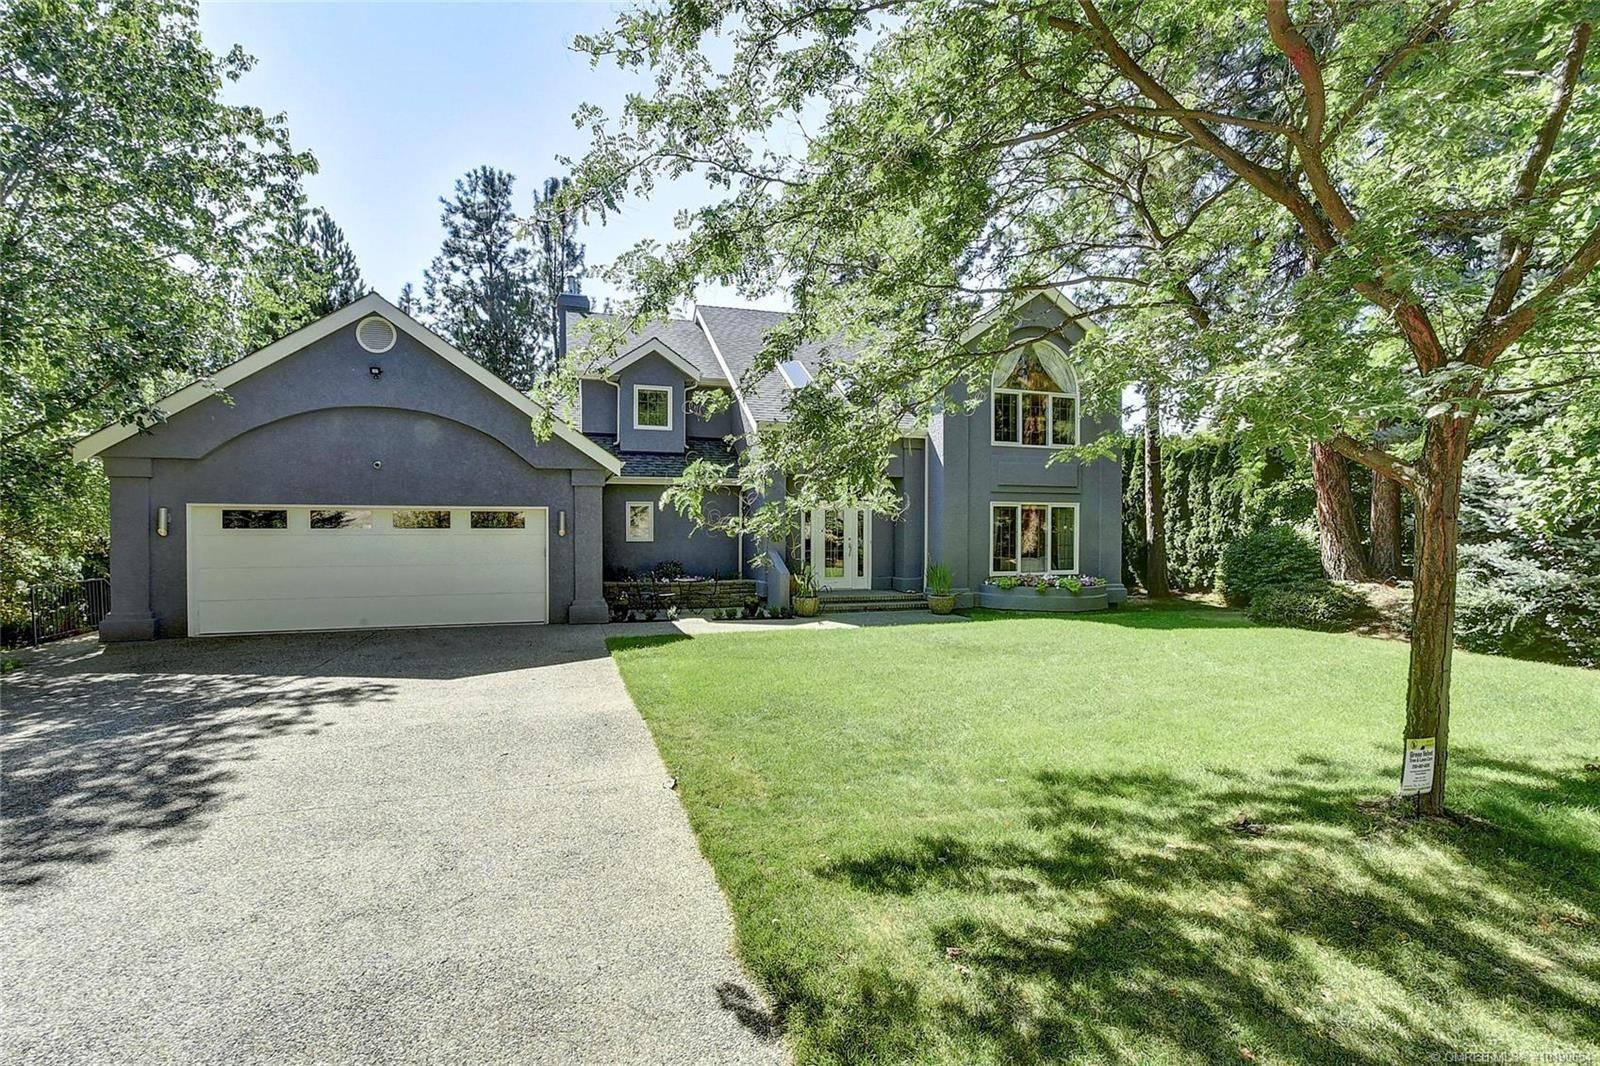 House for sale at 3926 Hyak Rd Kelowna British Columbia - MLS: 10190654